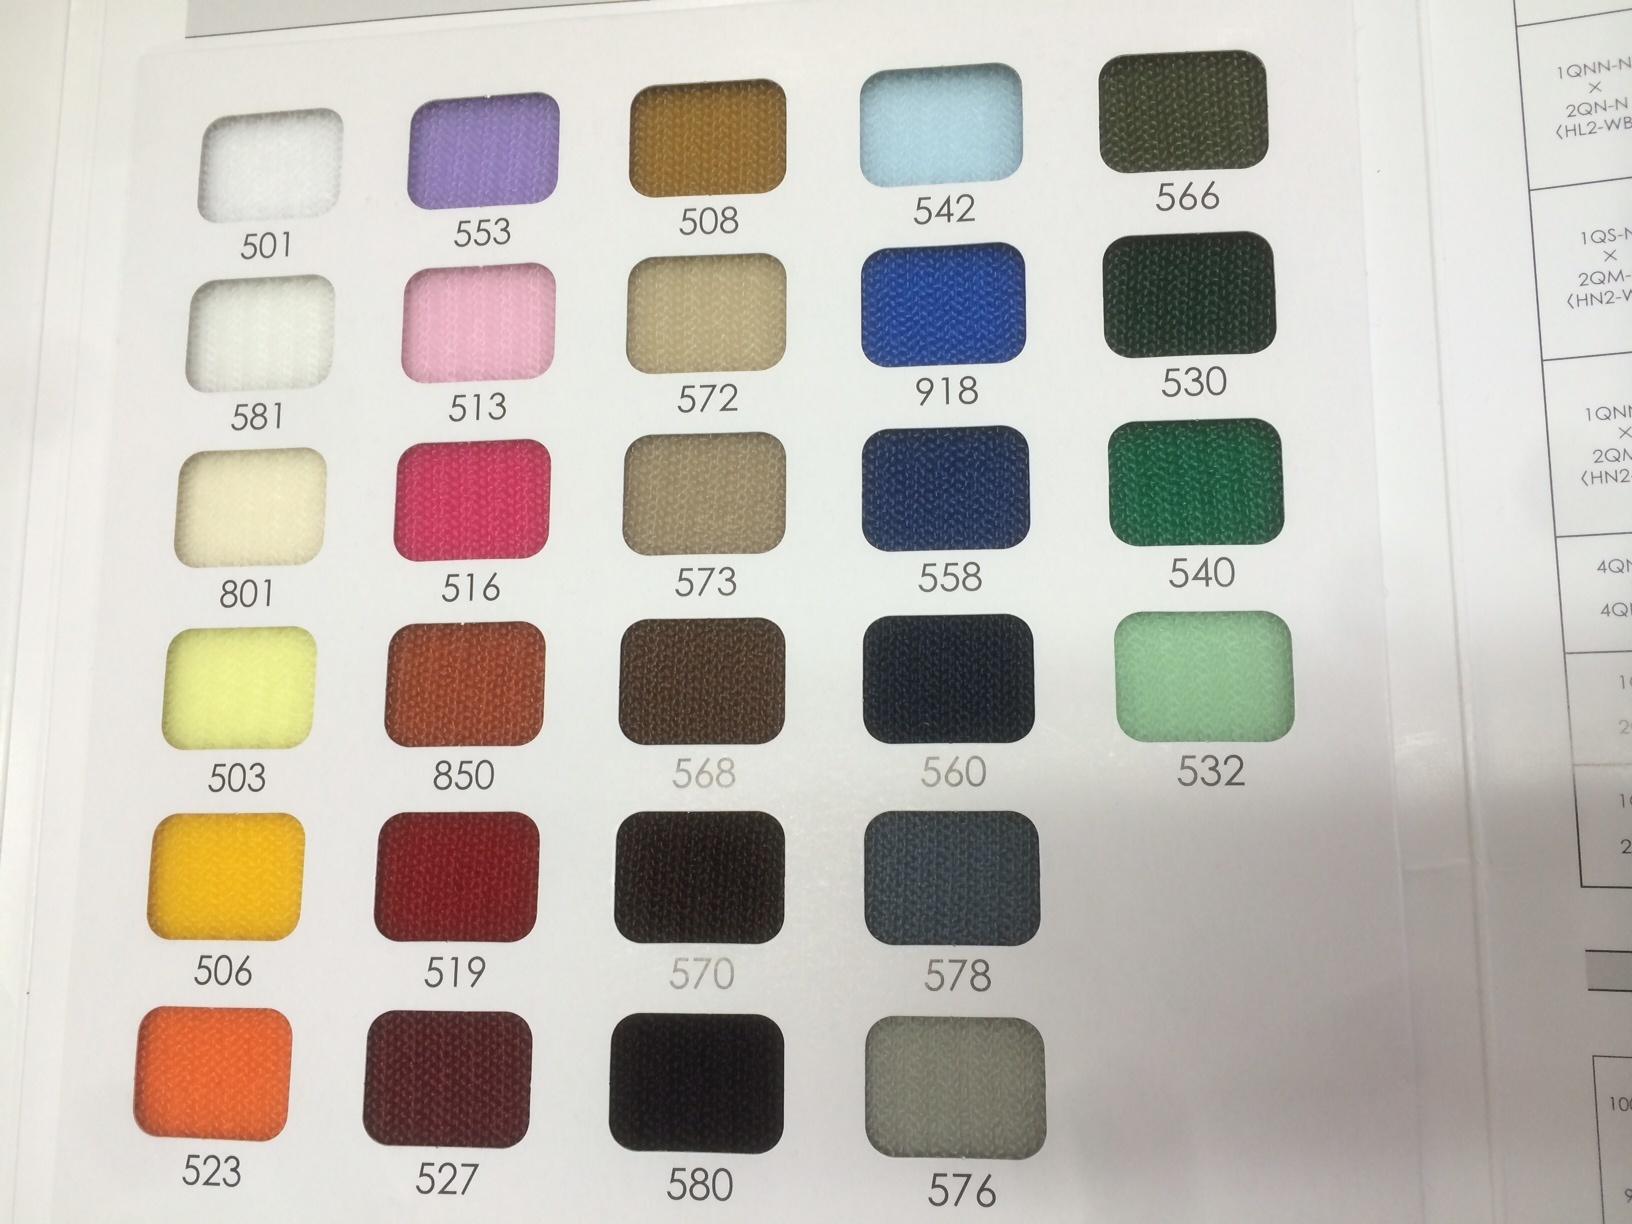 YKK クイックロン 1QNNと2QN フックとループのセット  黒と全カラー色 20㎜幅 1m